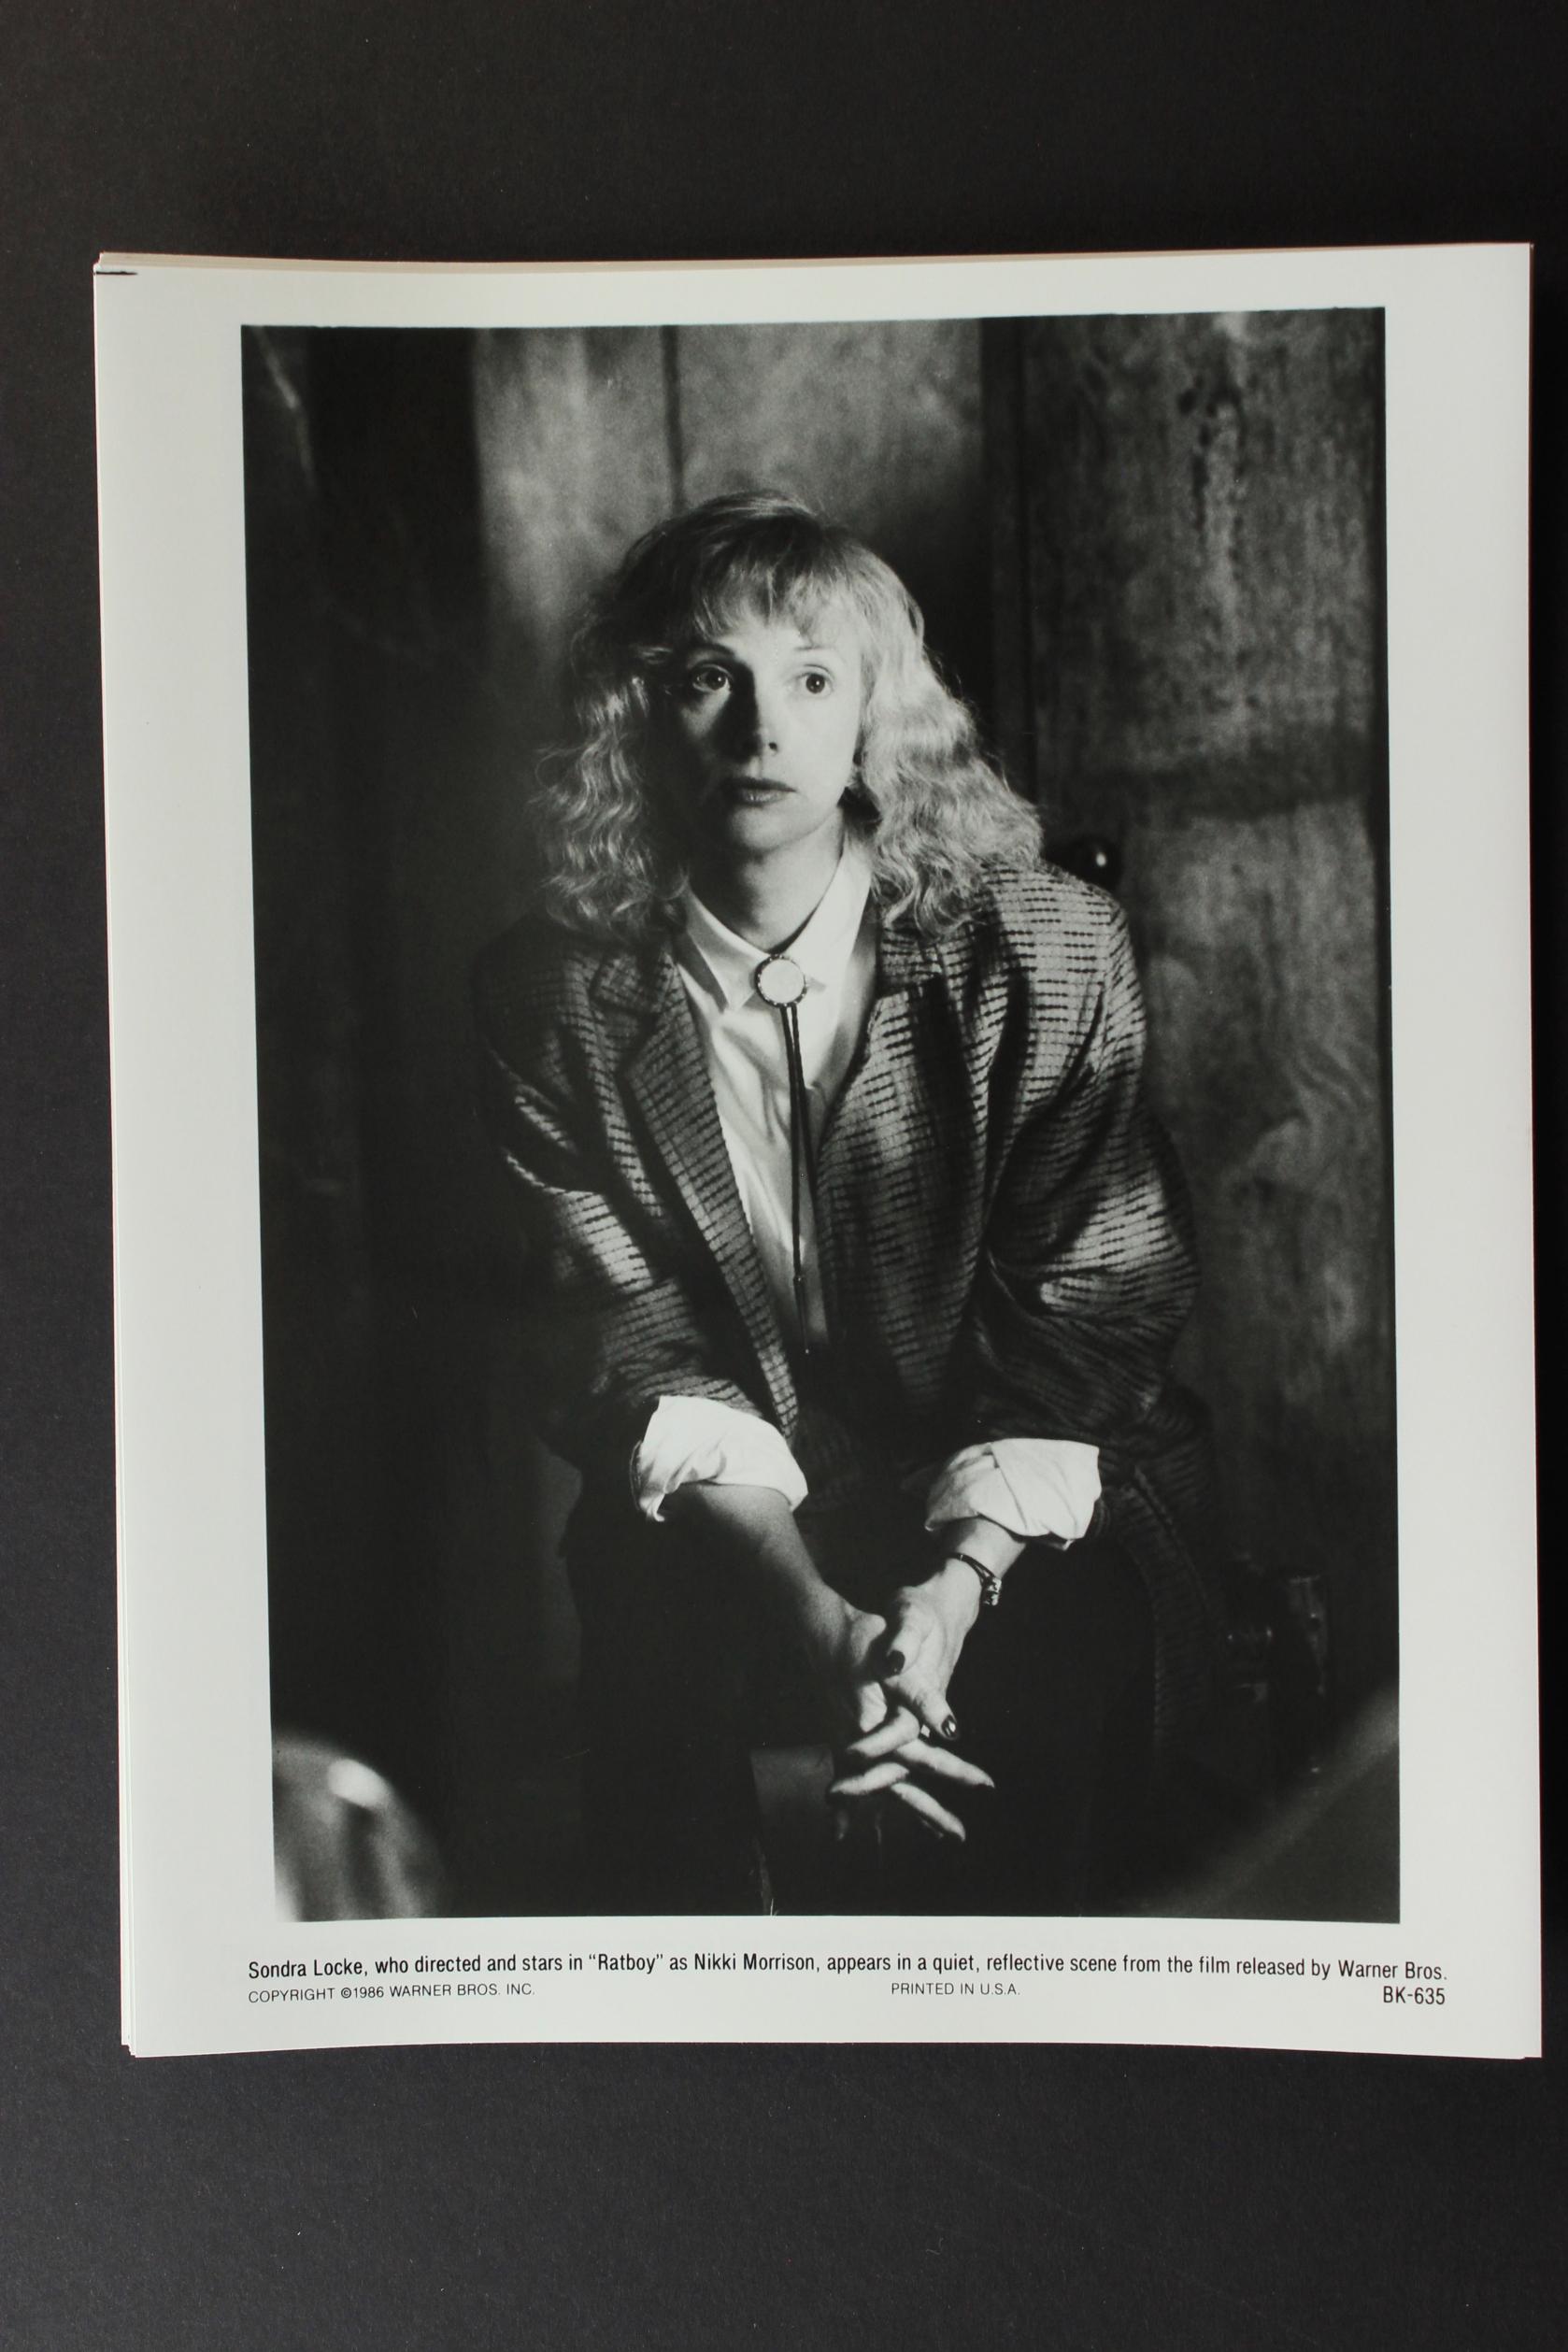 Sondra Locke in Ratboy (1986)